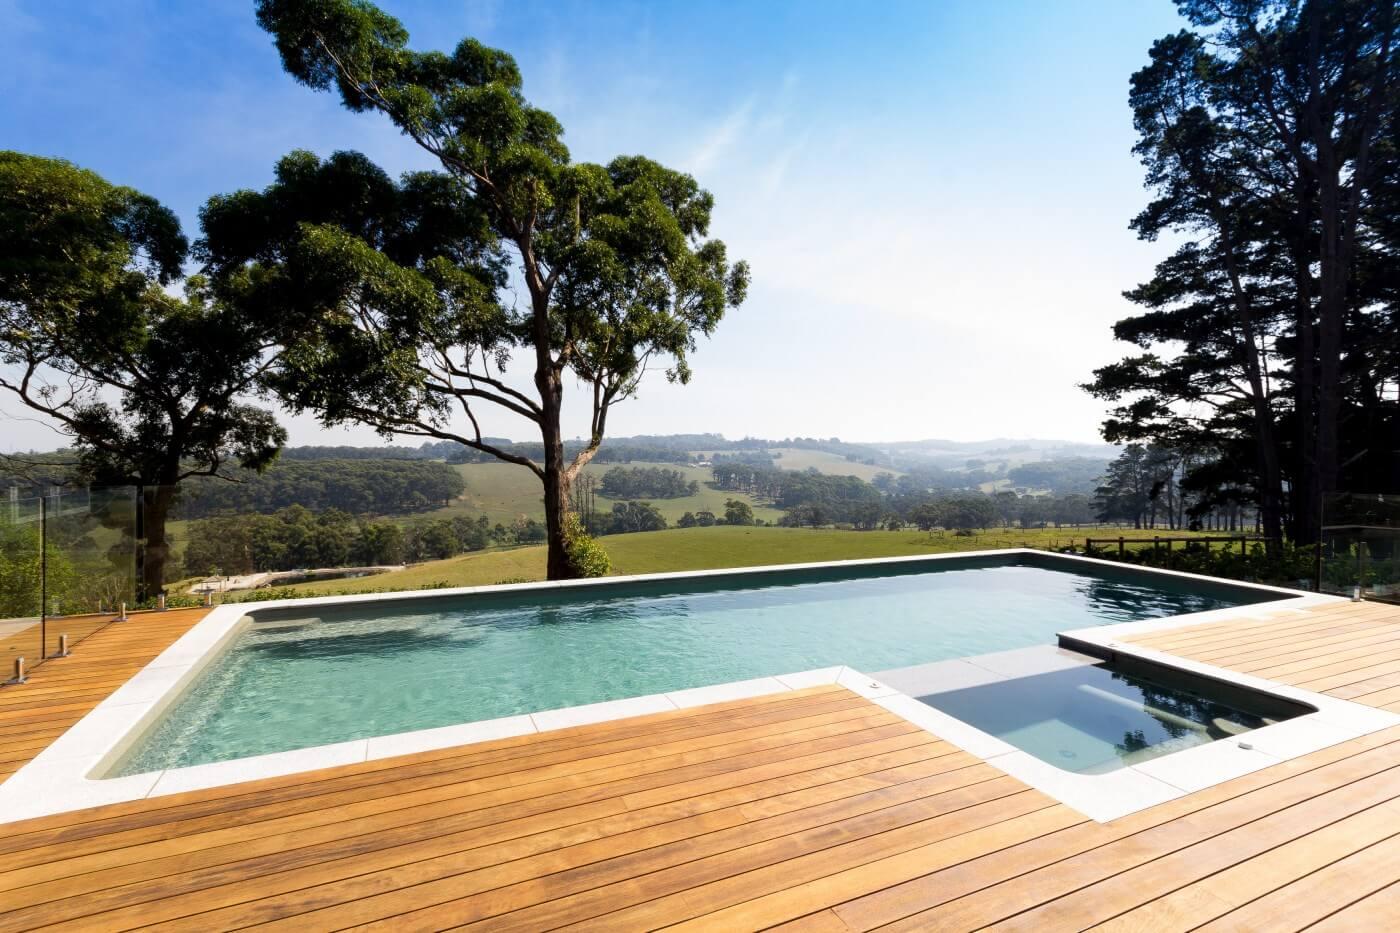 piscina de lux modele frumoase 56